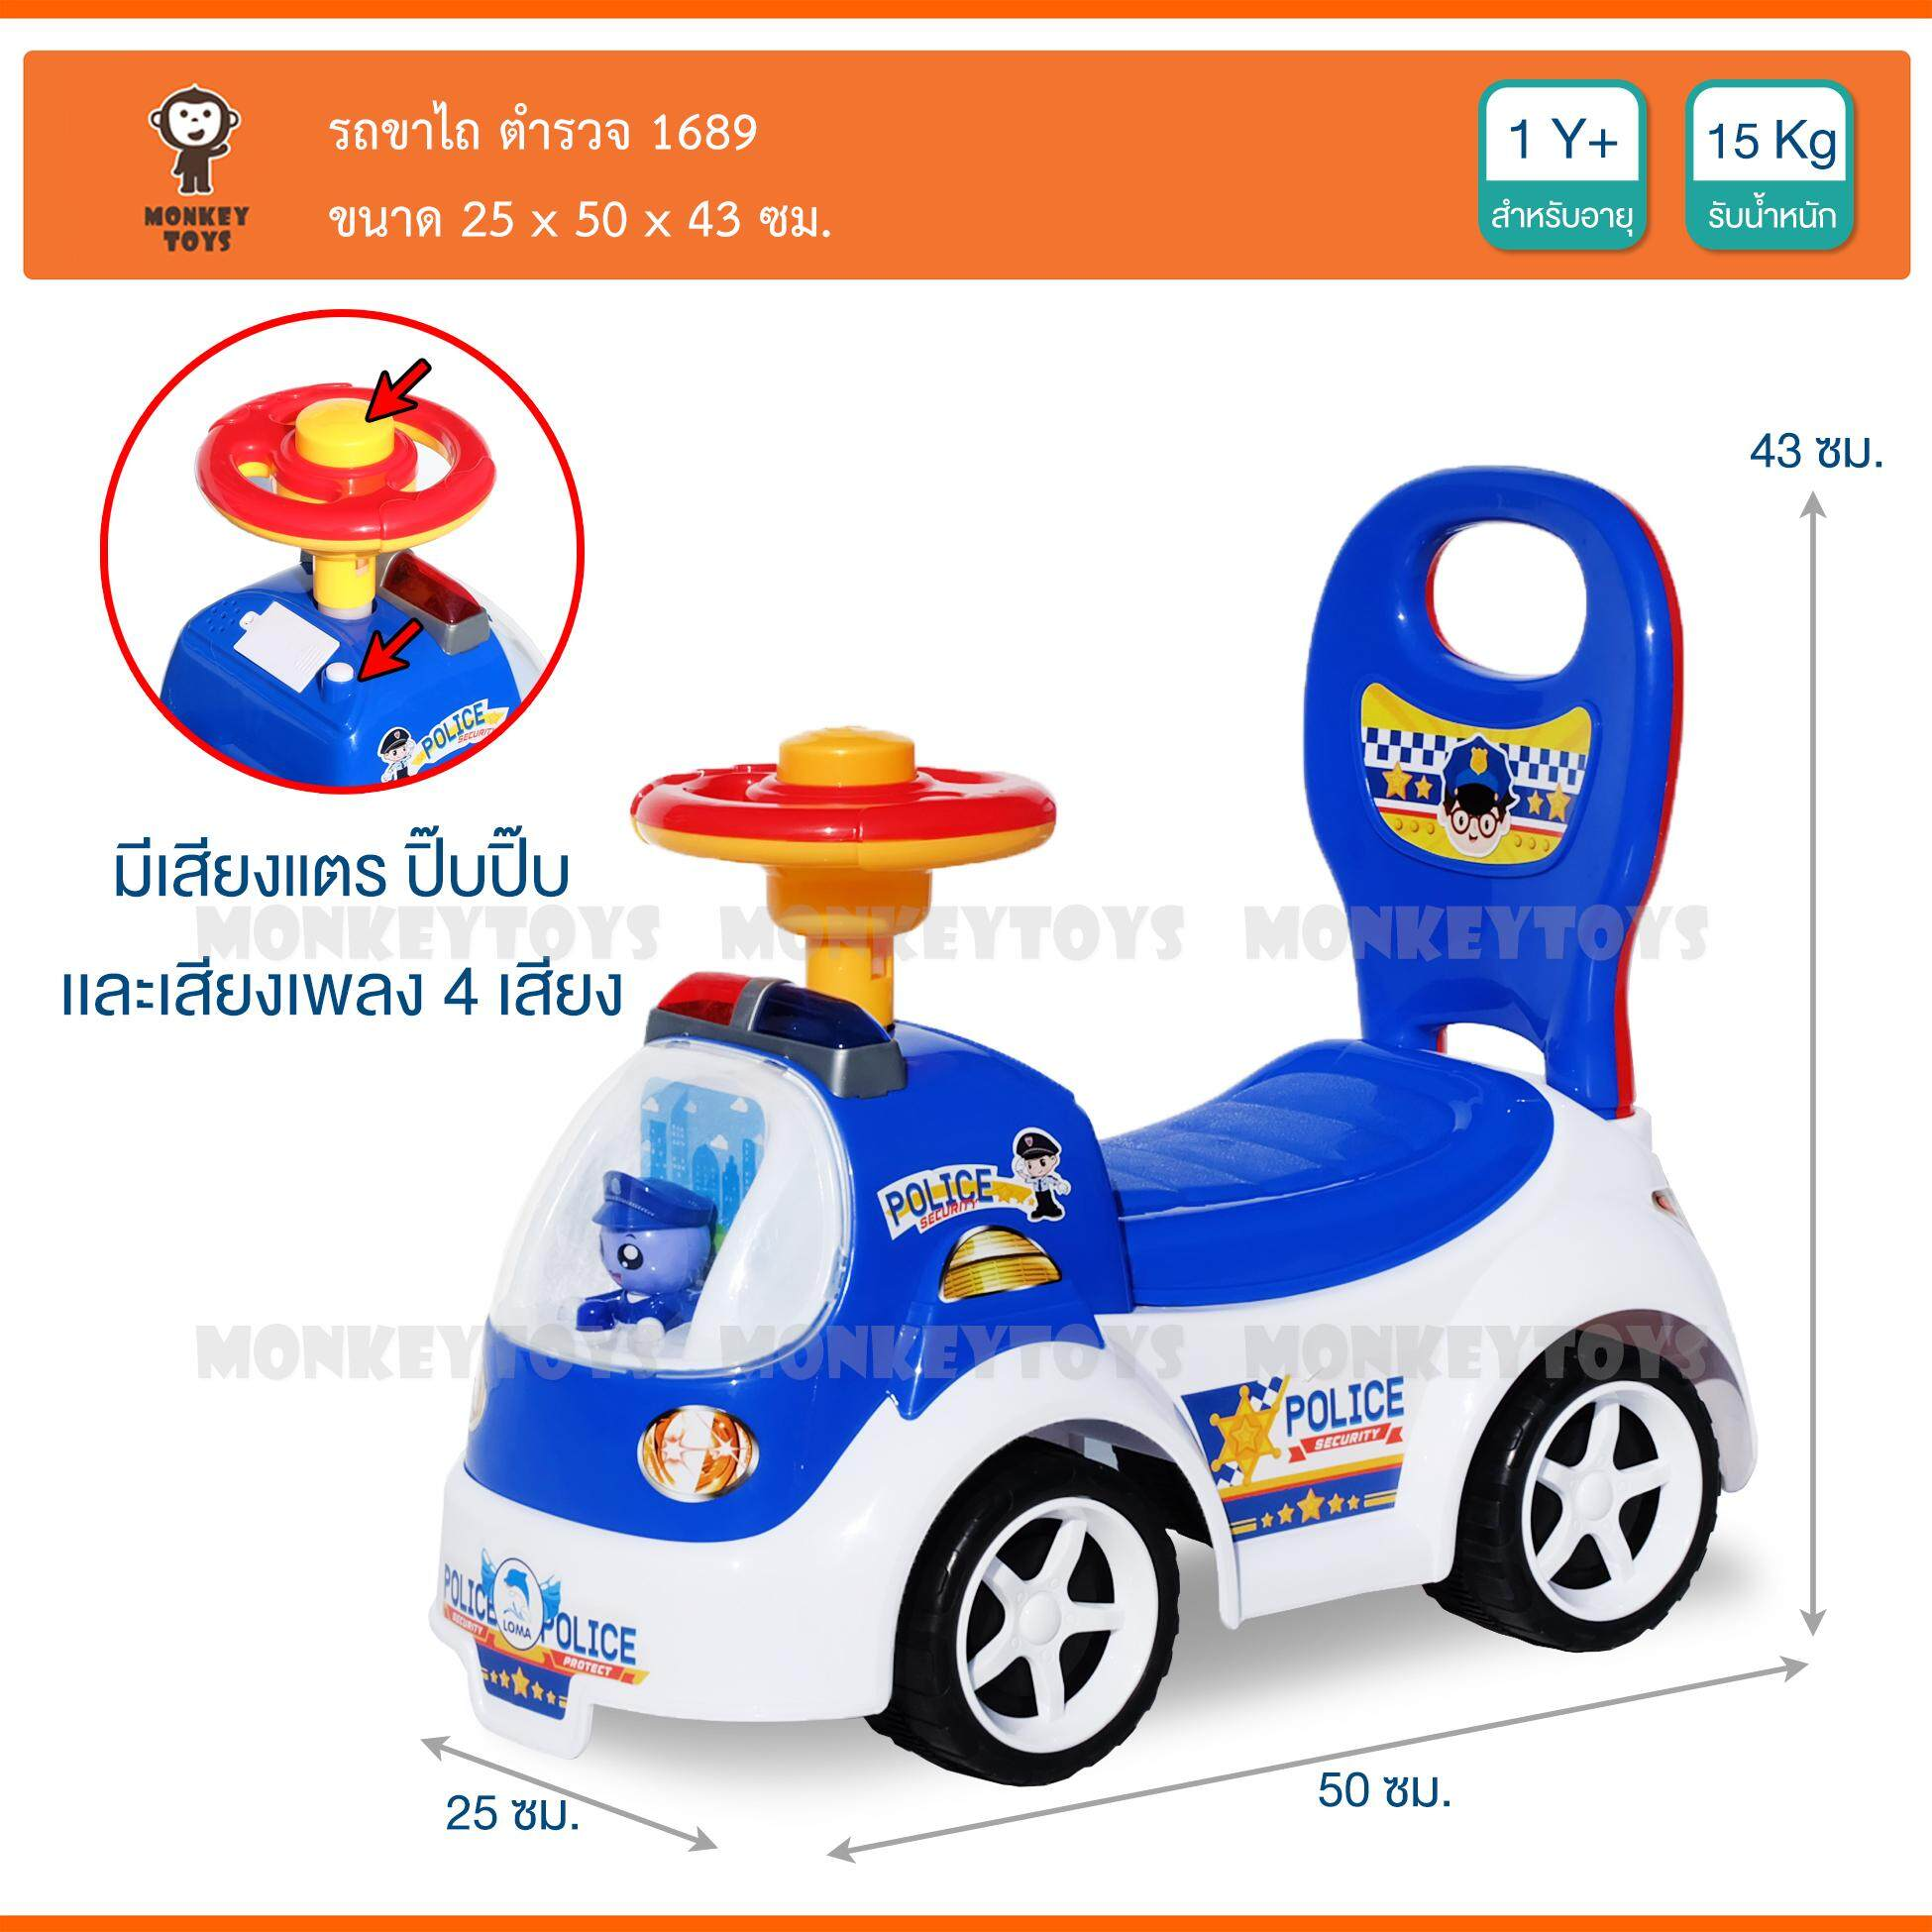 Monkey Toys ขาไถตำรวจ มีเสียง-มีไฟ 1689 Police Ride-On Car.